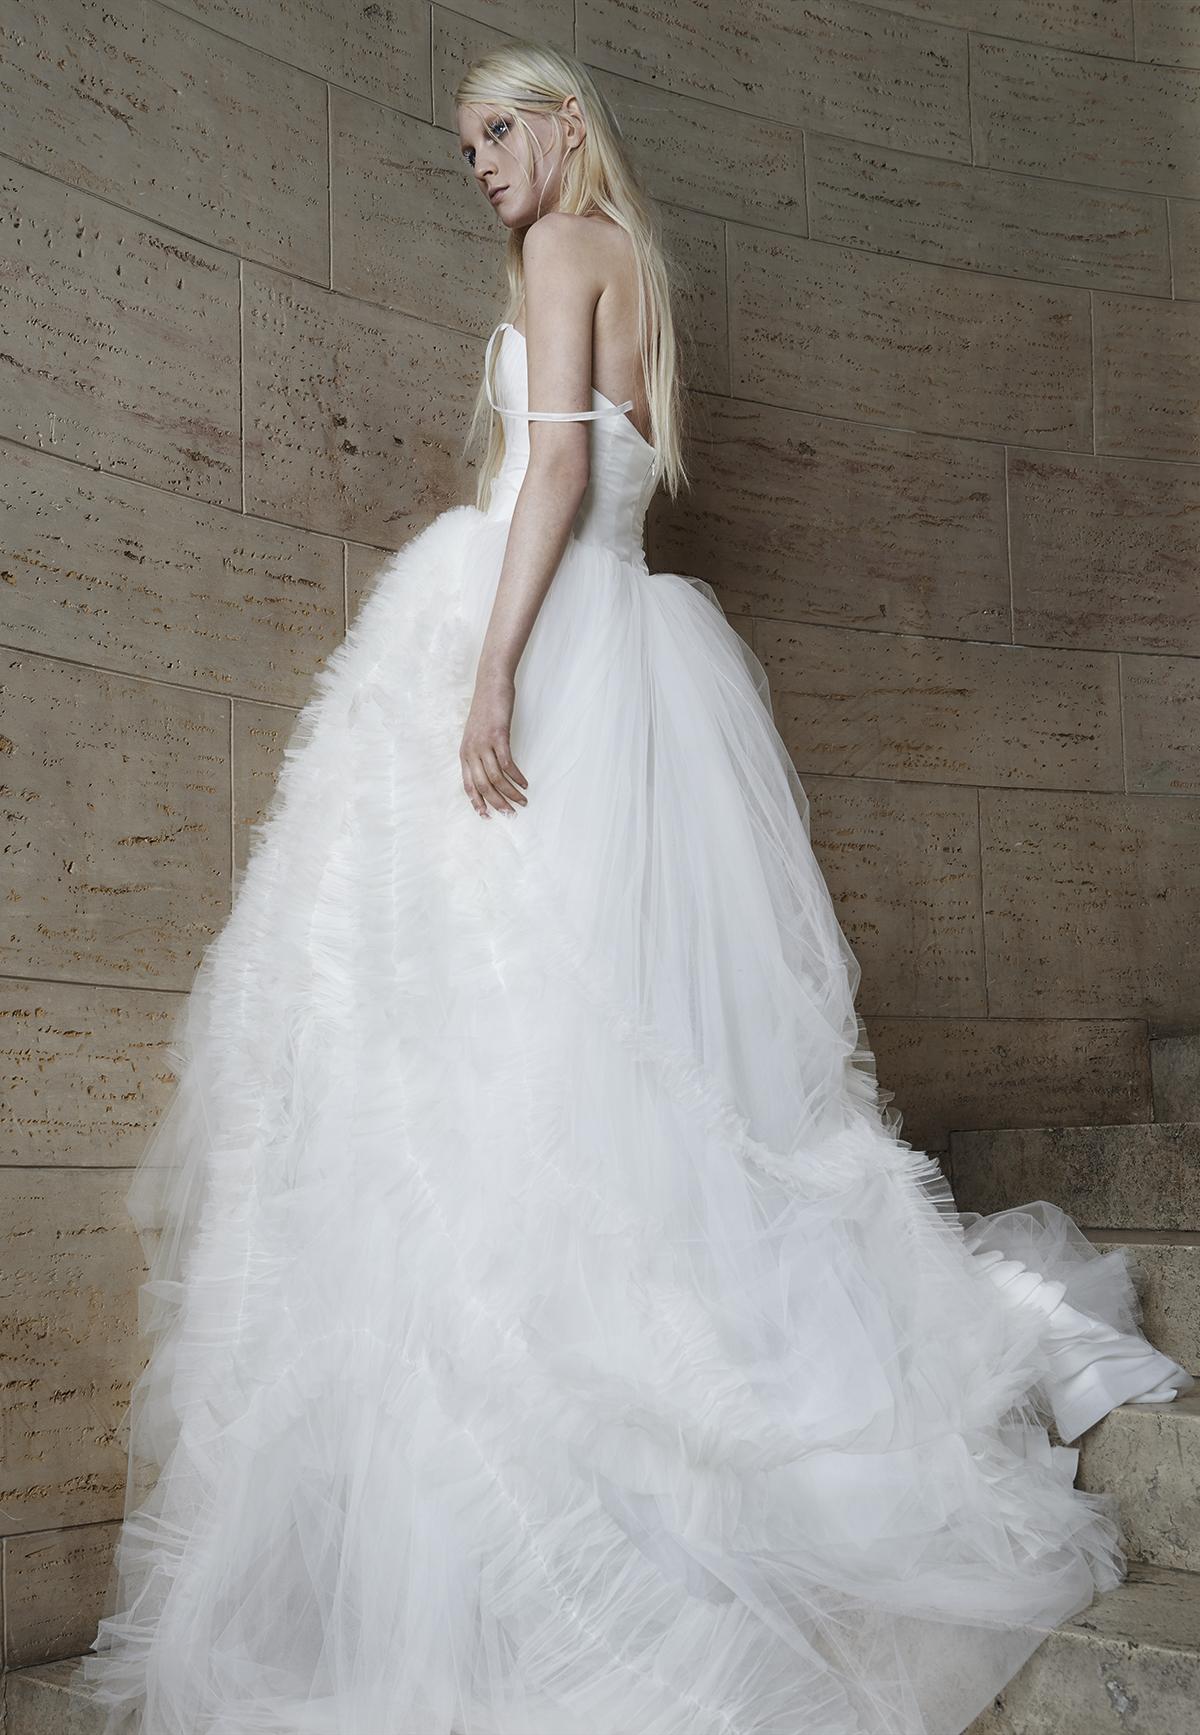 vera wang wedding dresses photo - 1